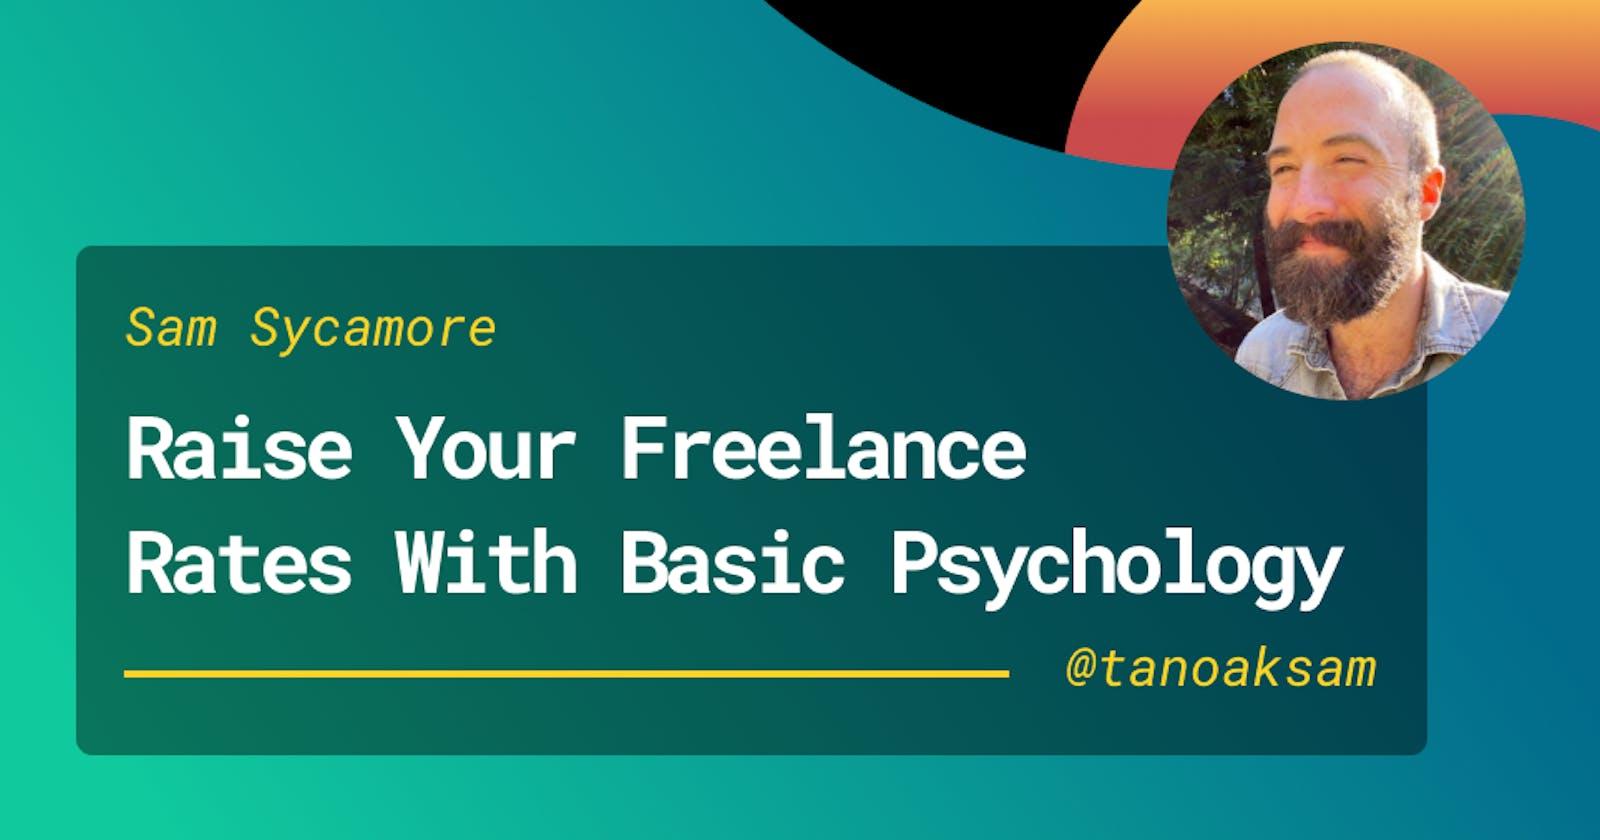 Make More Money as a Freelancer Using Basic Psychology